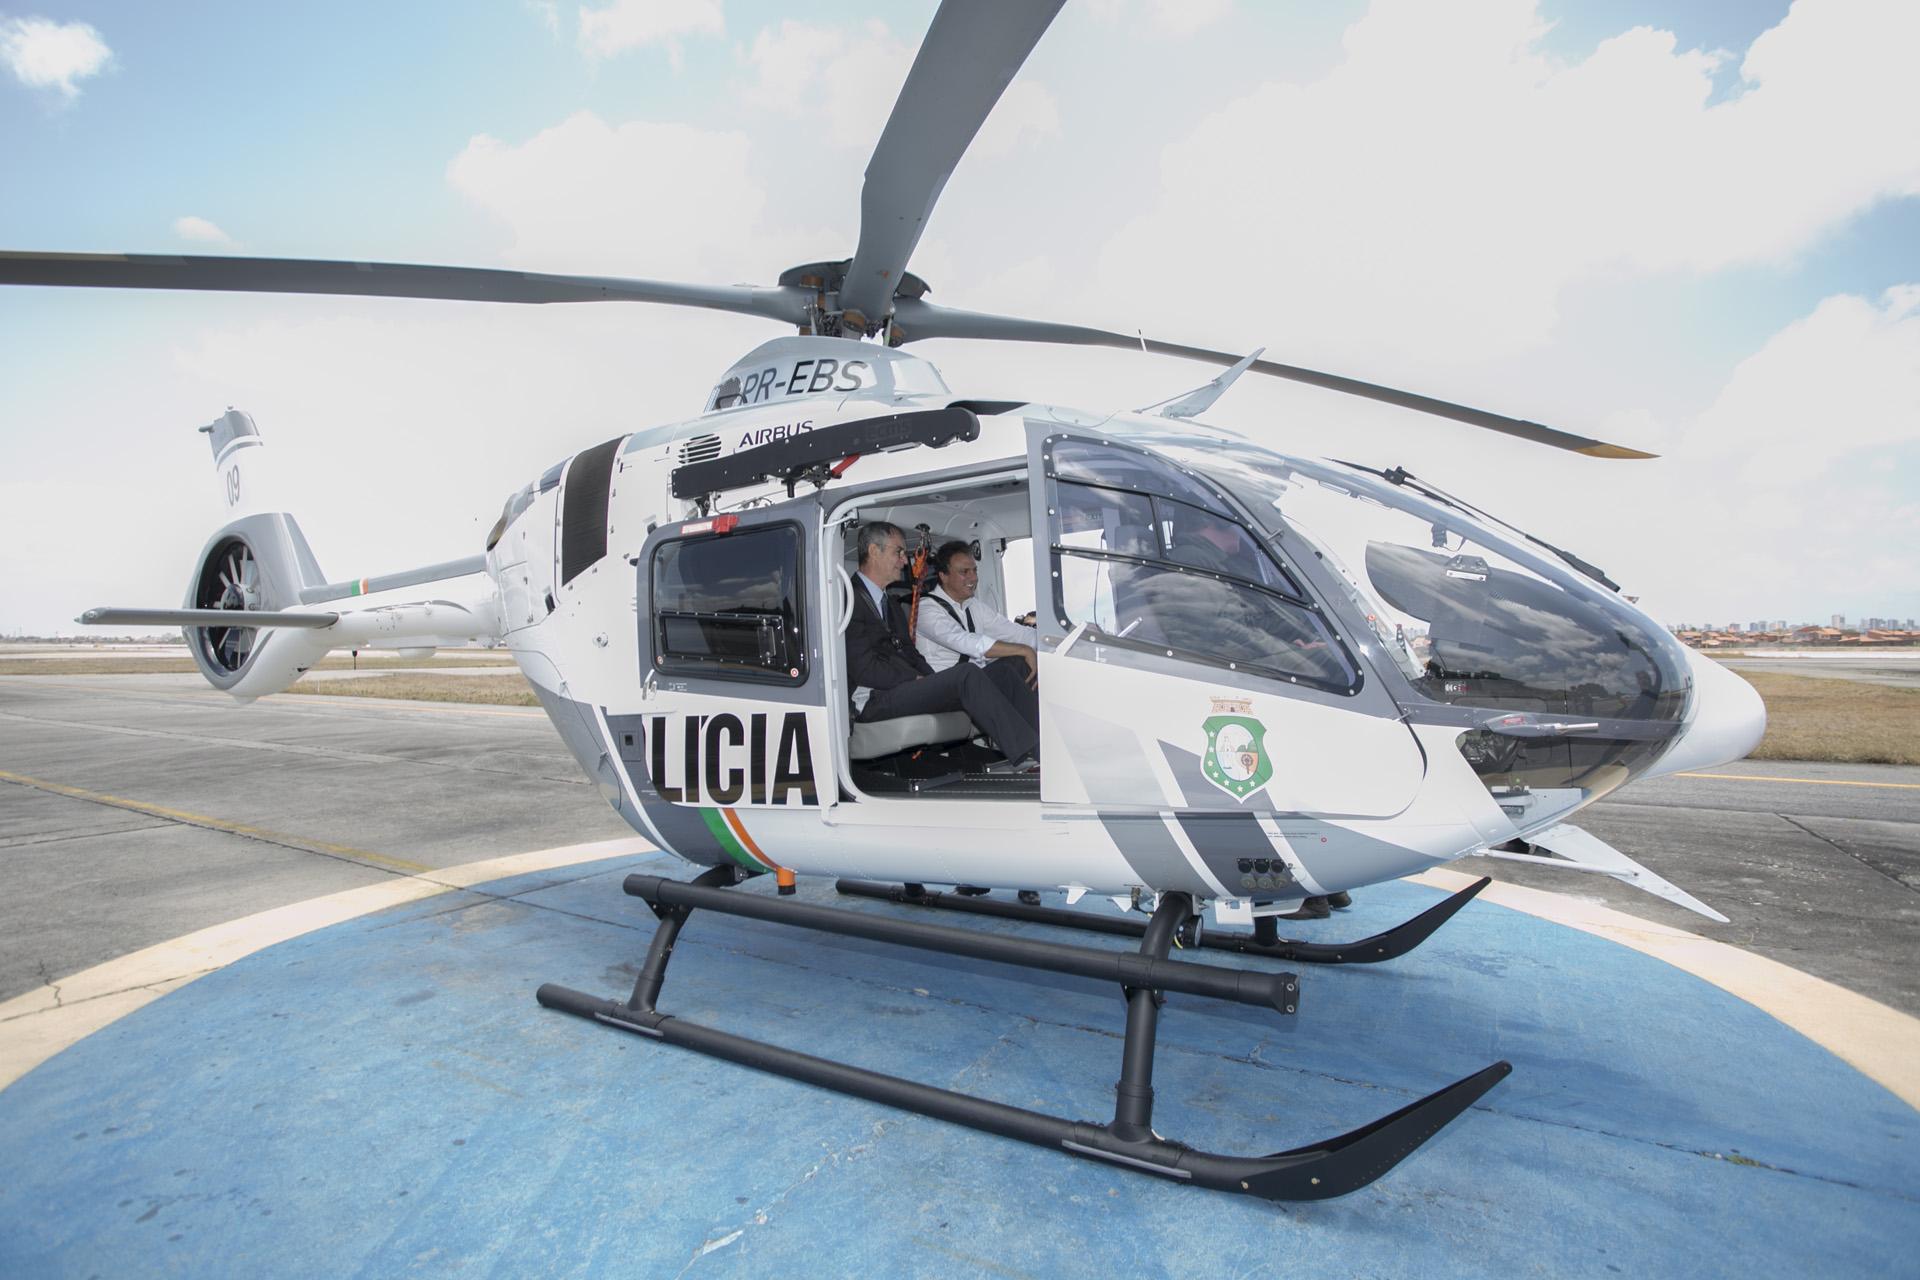 Com entrega de dois novos helicópteros para Ciopaer, Ceará passa a ter terceira maior frota policial de aeronaves do Brasil